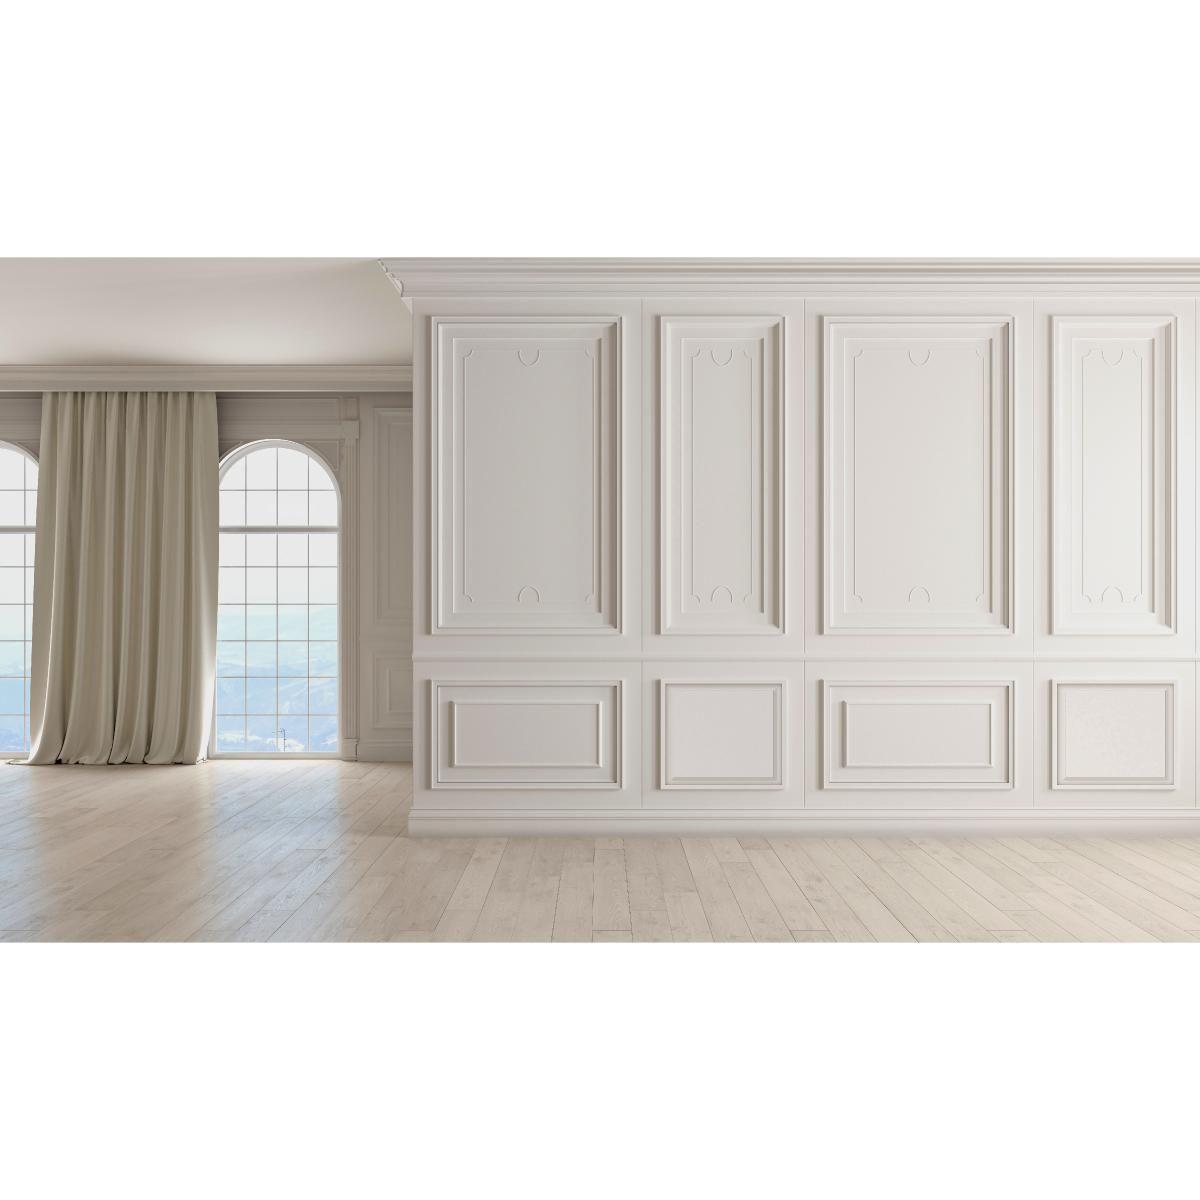 Harrison Raised Panel Decorative Wall Panel In 2020 White Paneling Decorative Wall Panels Wall Paneling